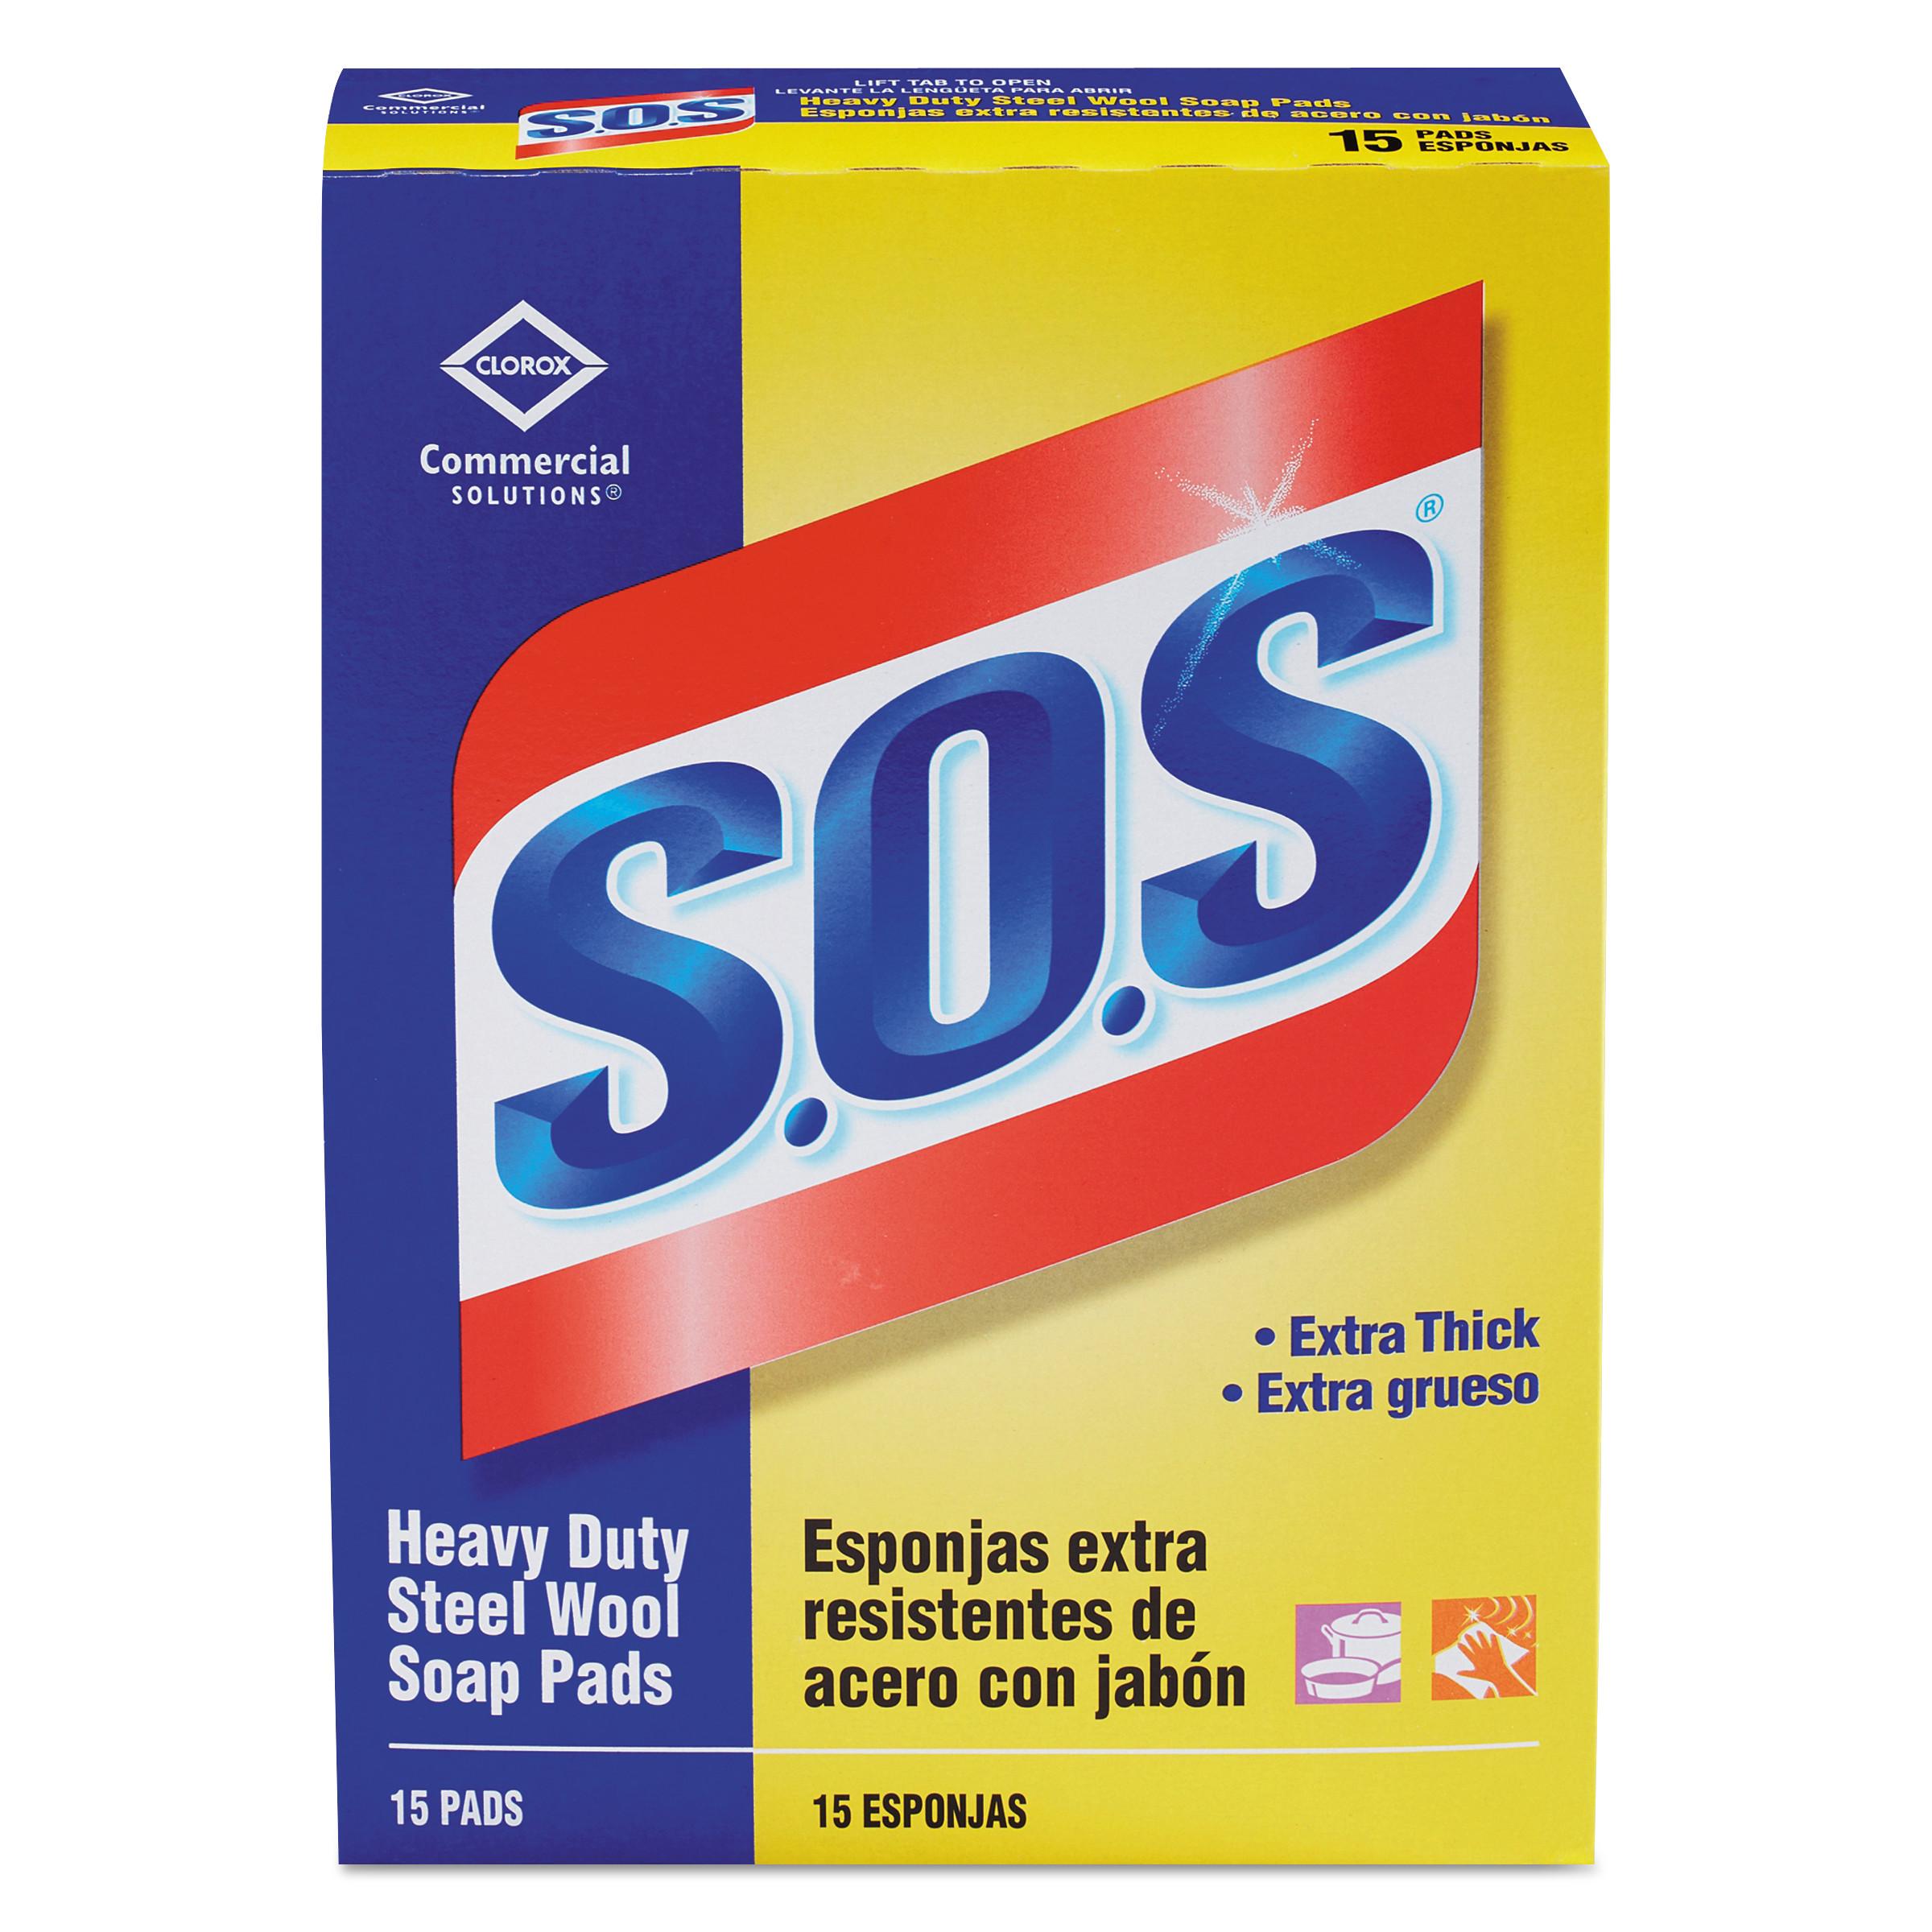 Steel Wool Soap Pad, 15 Pads/Box